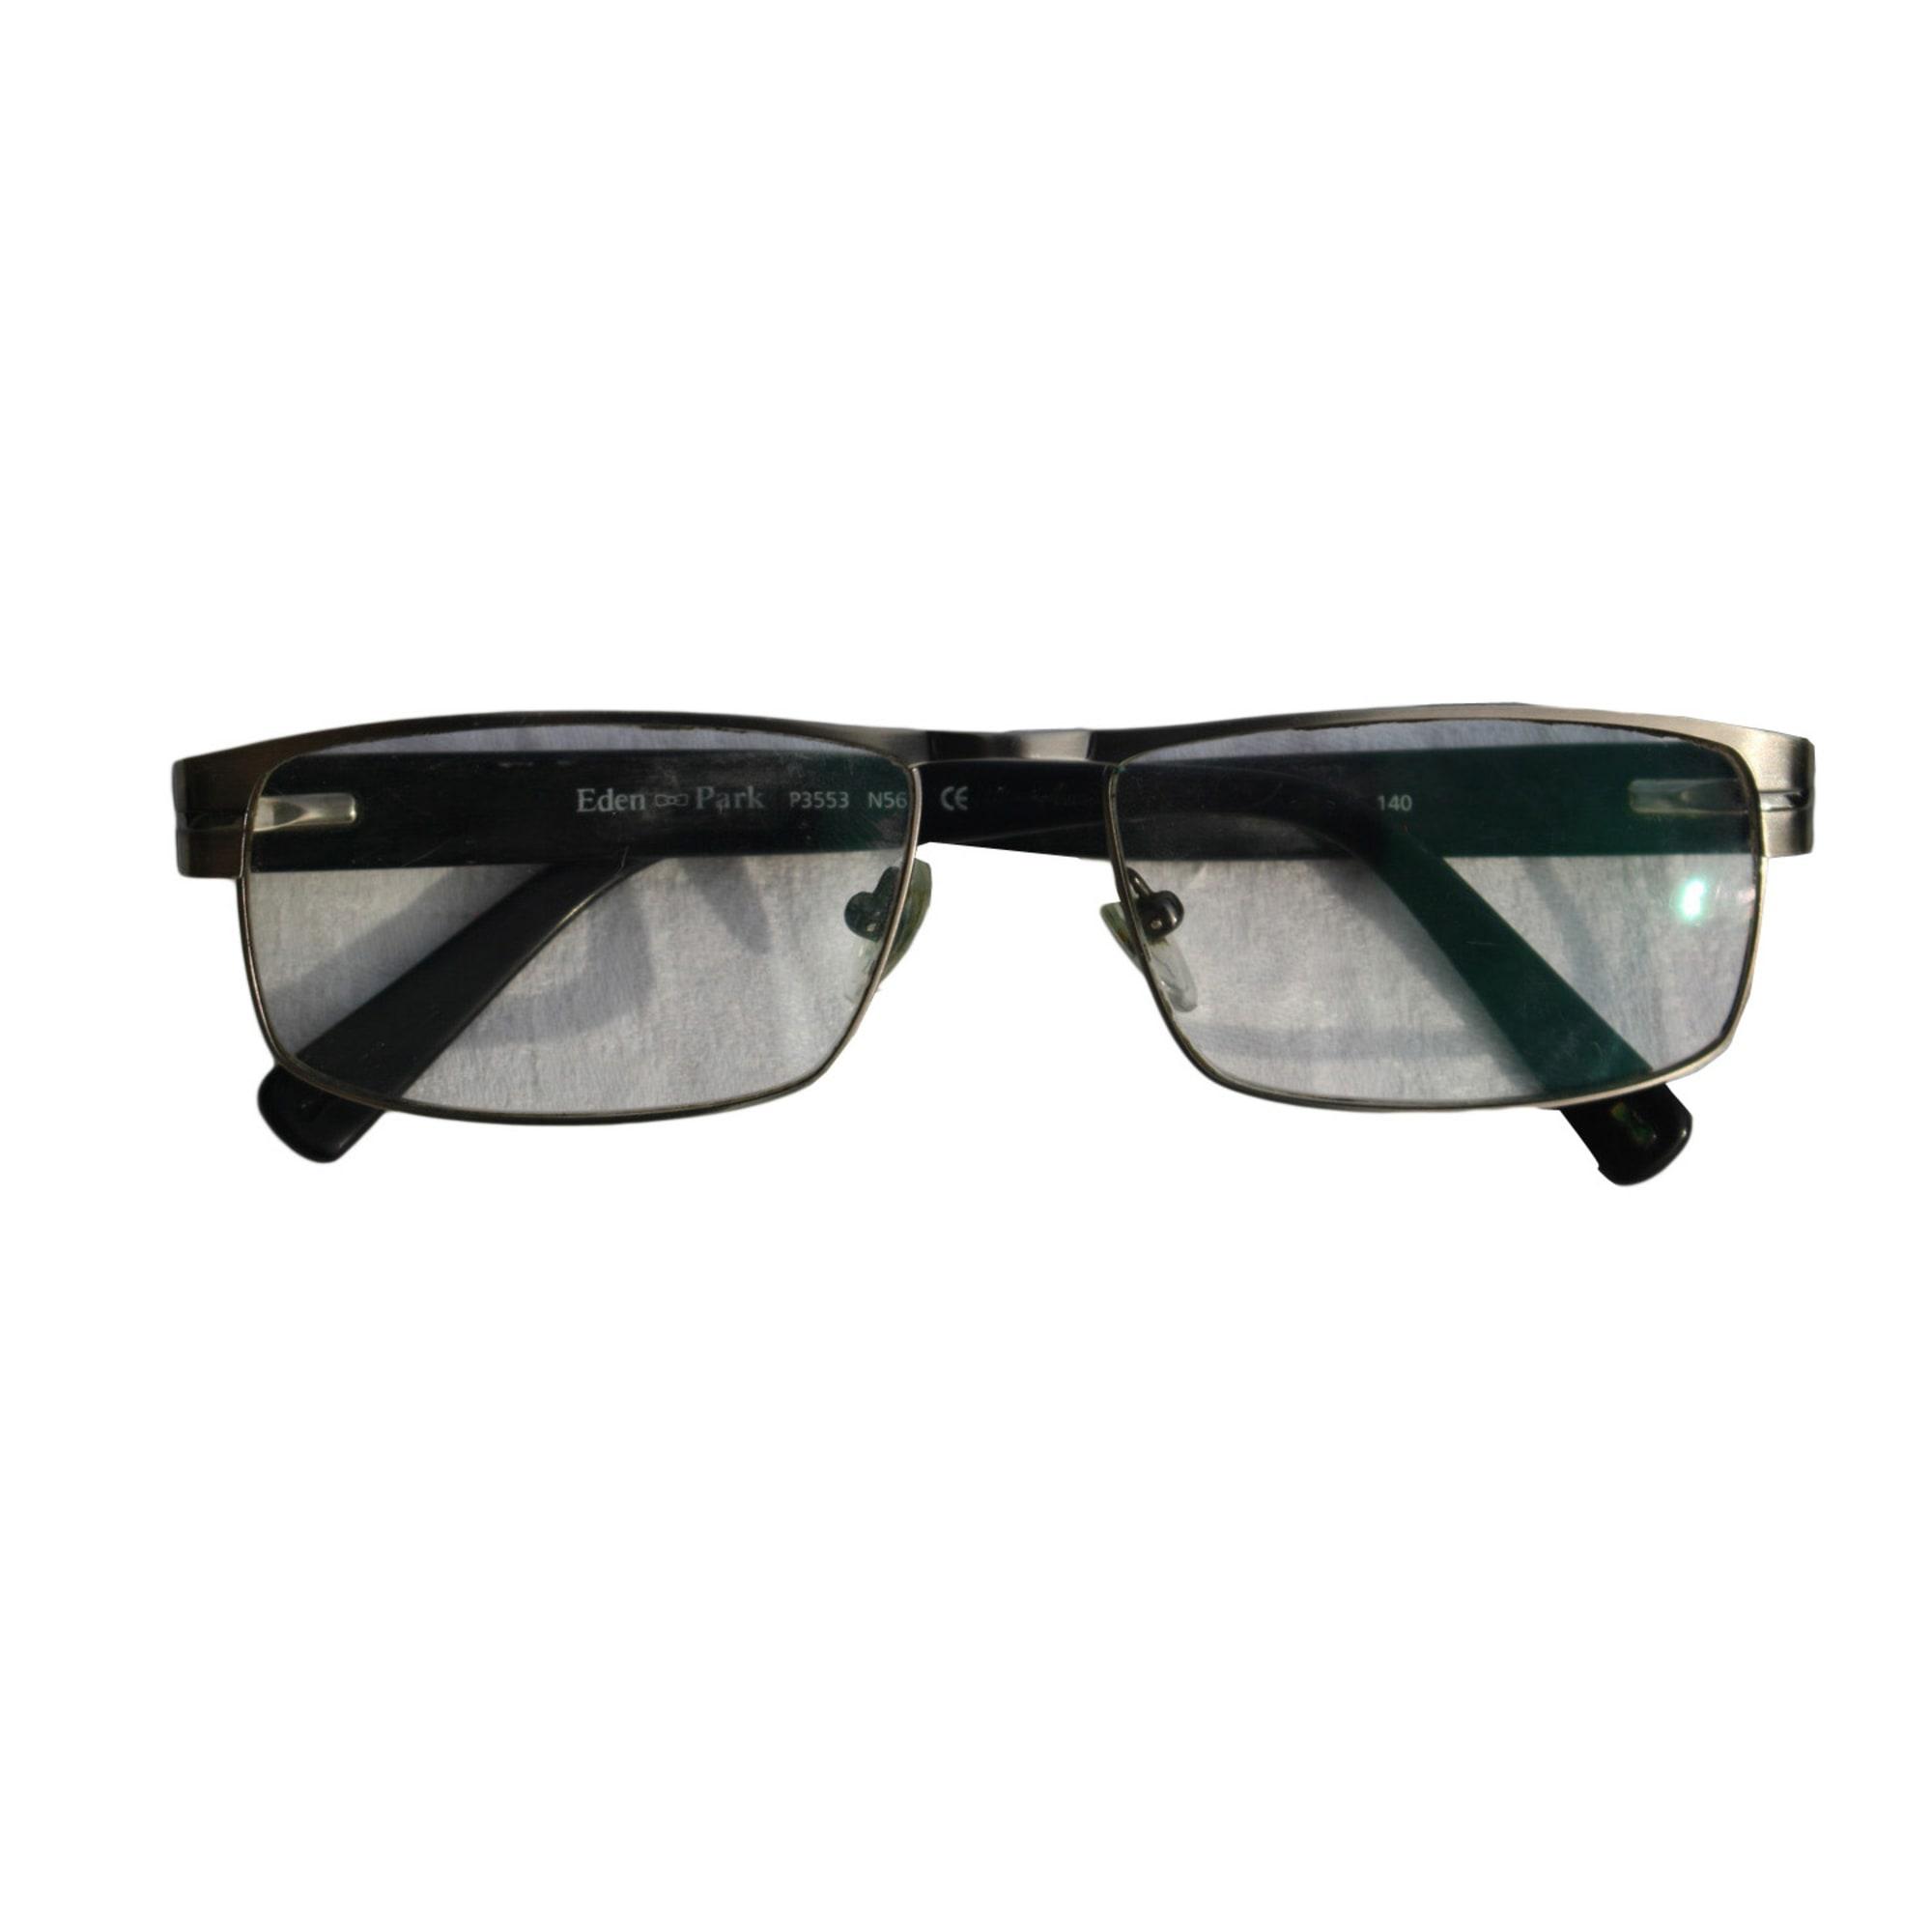 Eyeglass Frames EDEN PARK Black